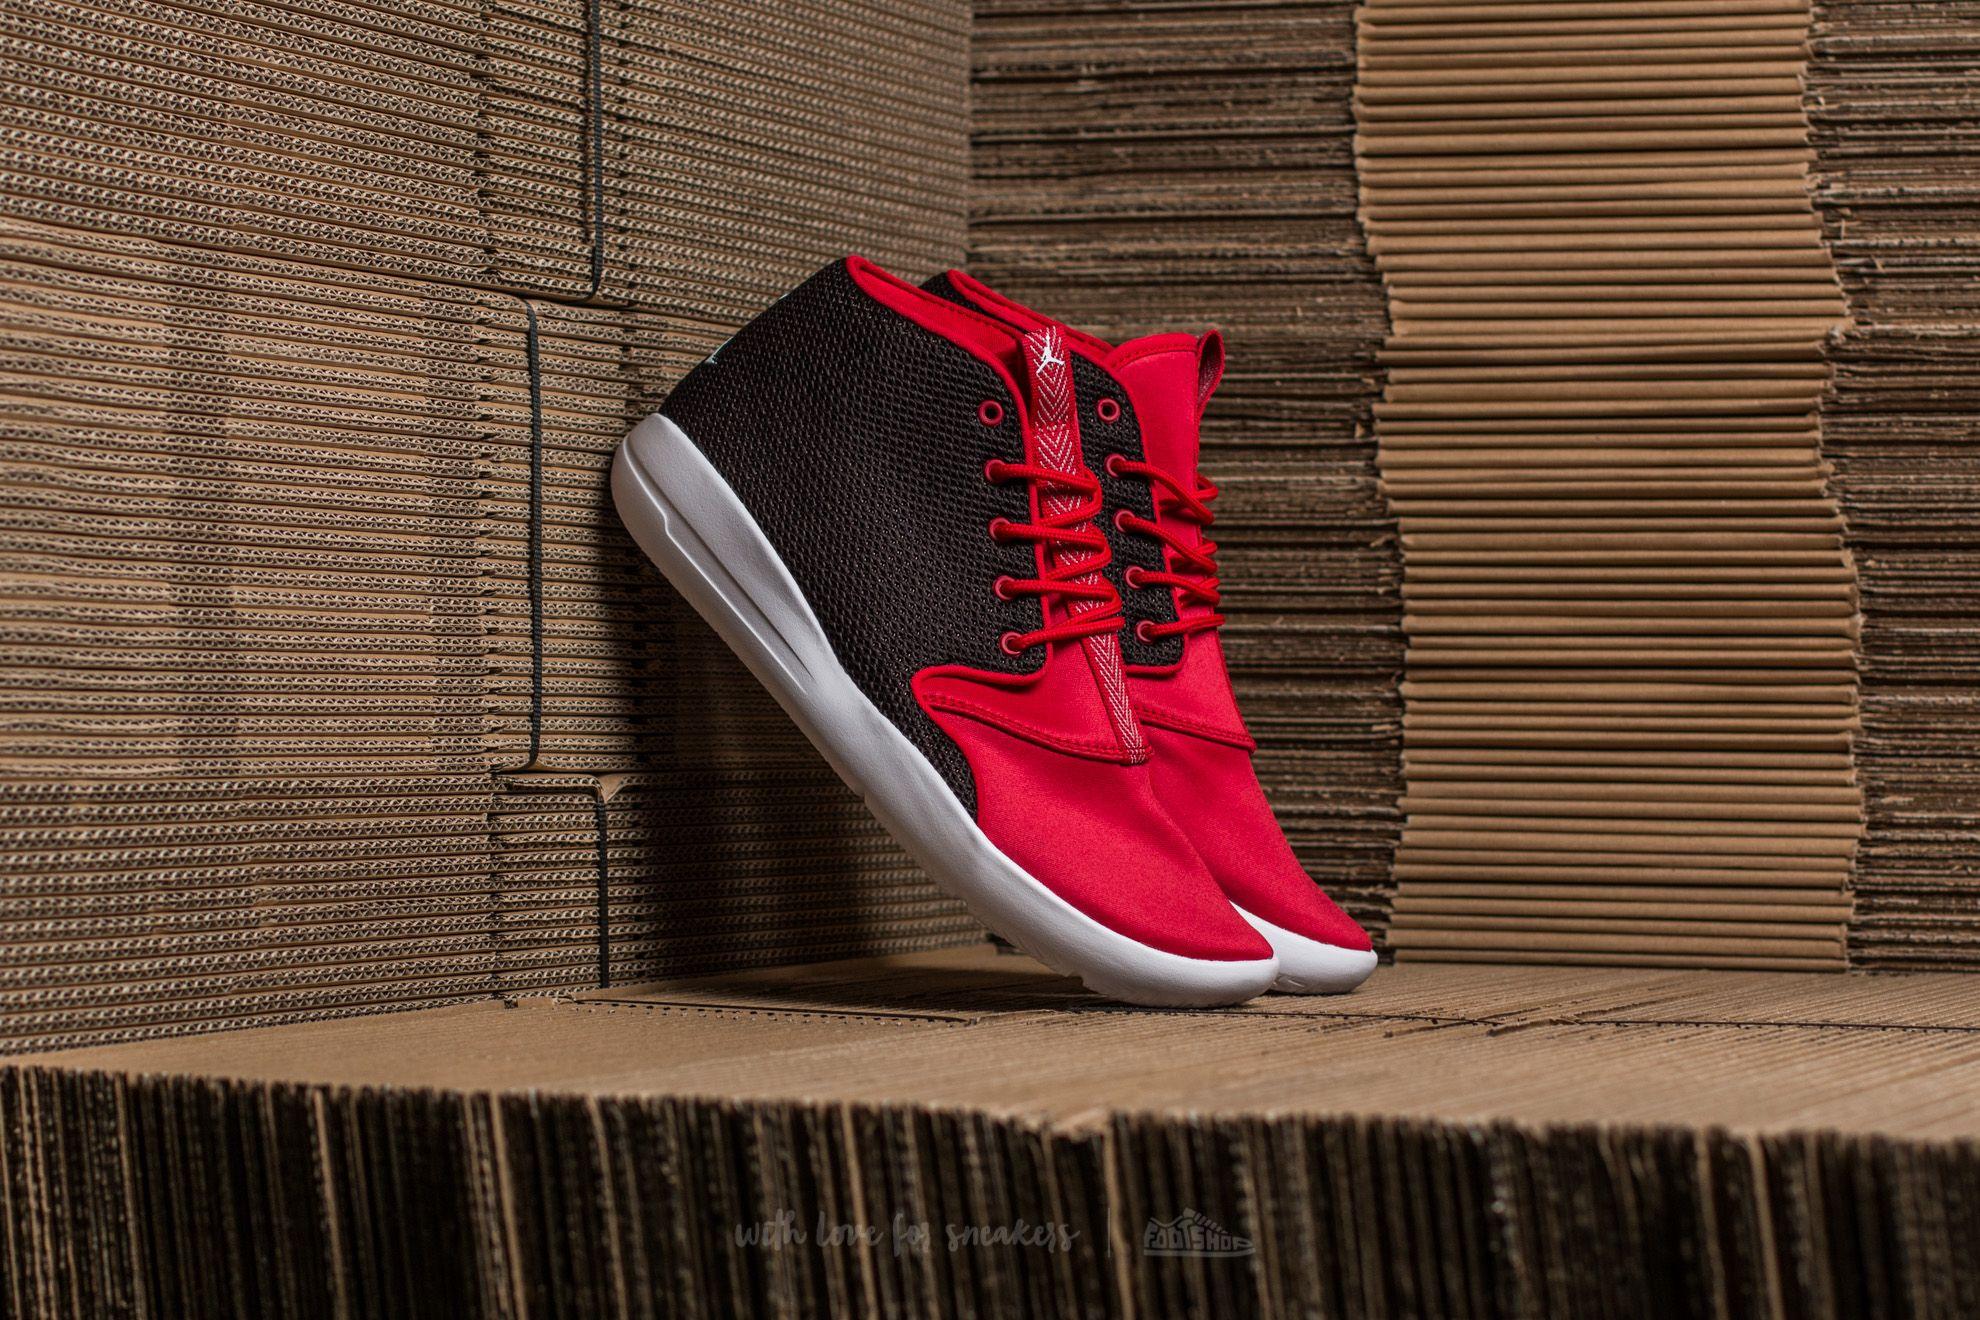 046a9d94f Jordan Eclipse Chukka BG Black  White-Gym Red-White